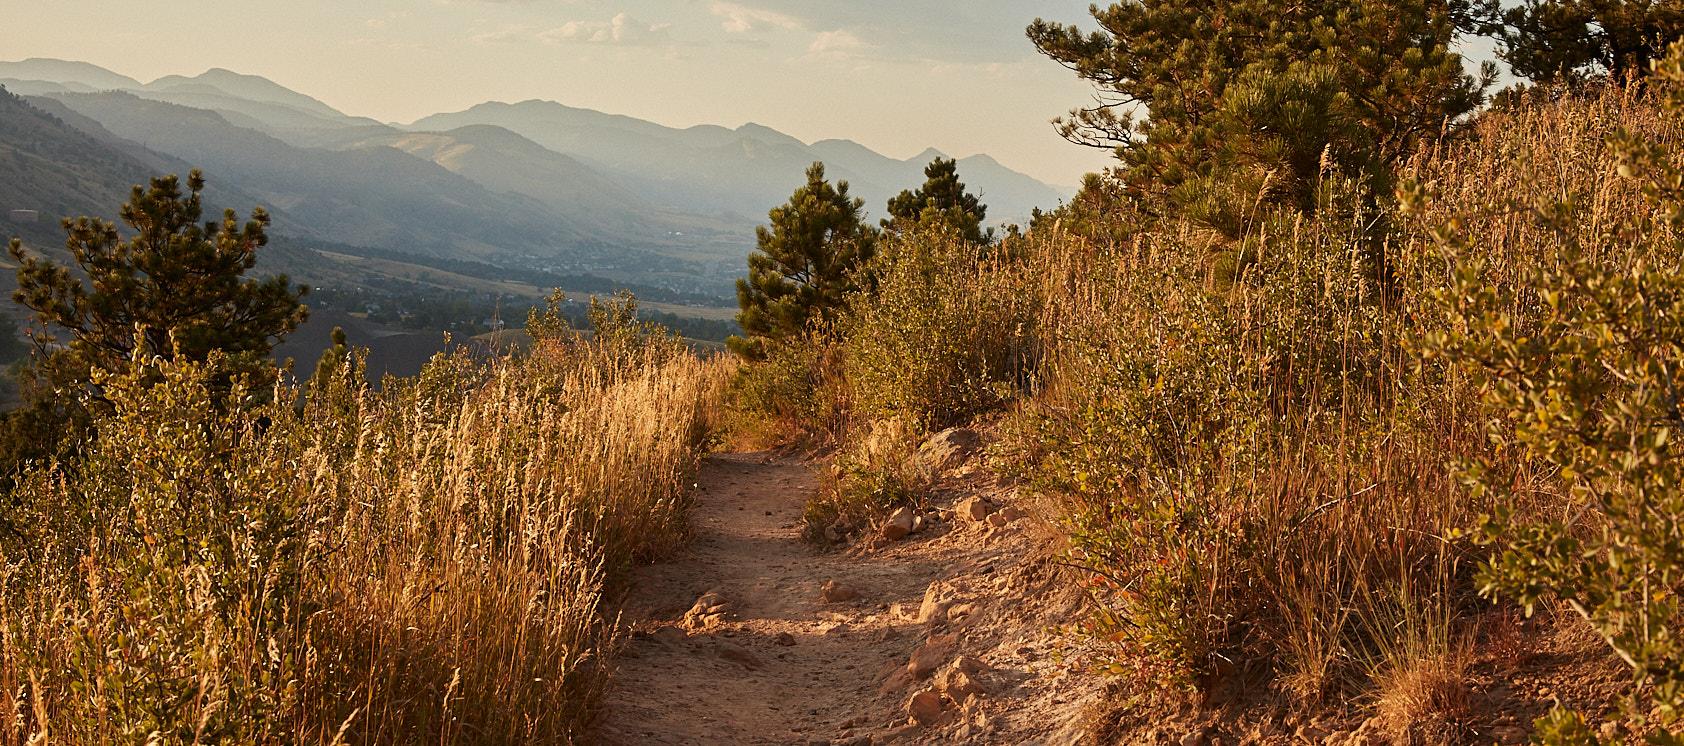 Trail running at dusk on Dakota Ridge near Denver, CO for Native Roots Cannabis Co.